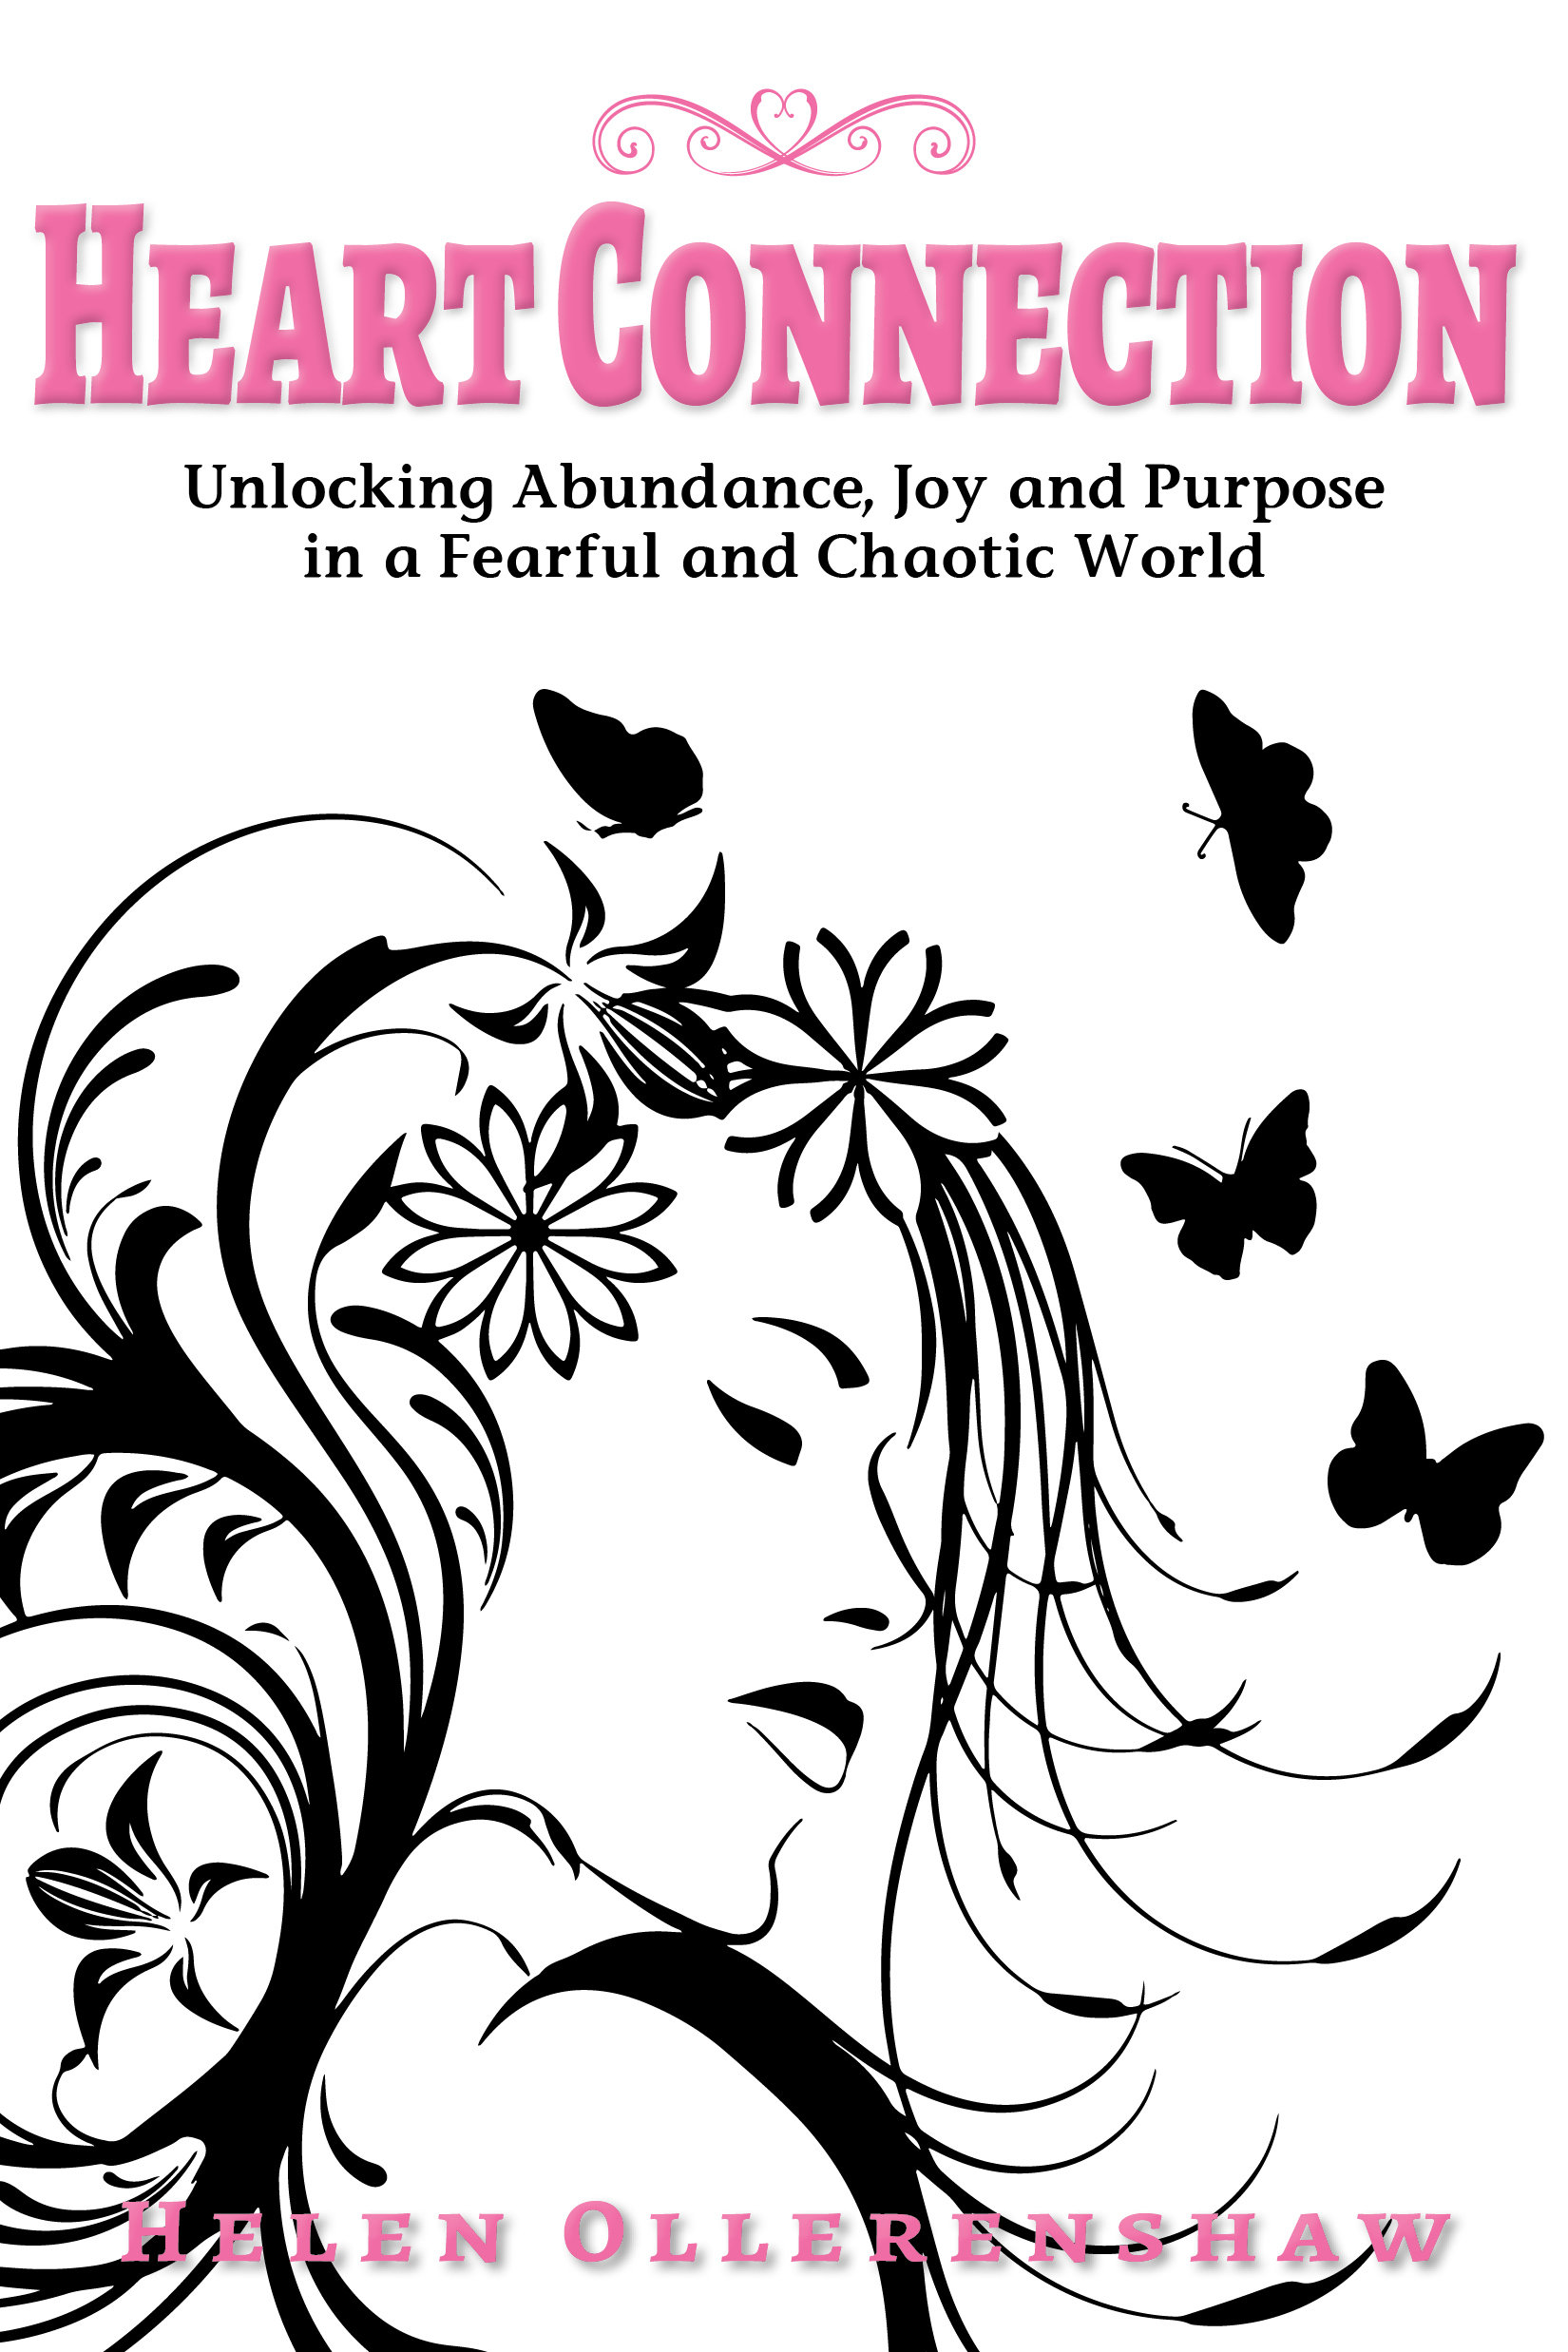 HeartConnection - Unlocking Abundance, Joy and Purpose 00012